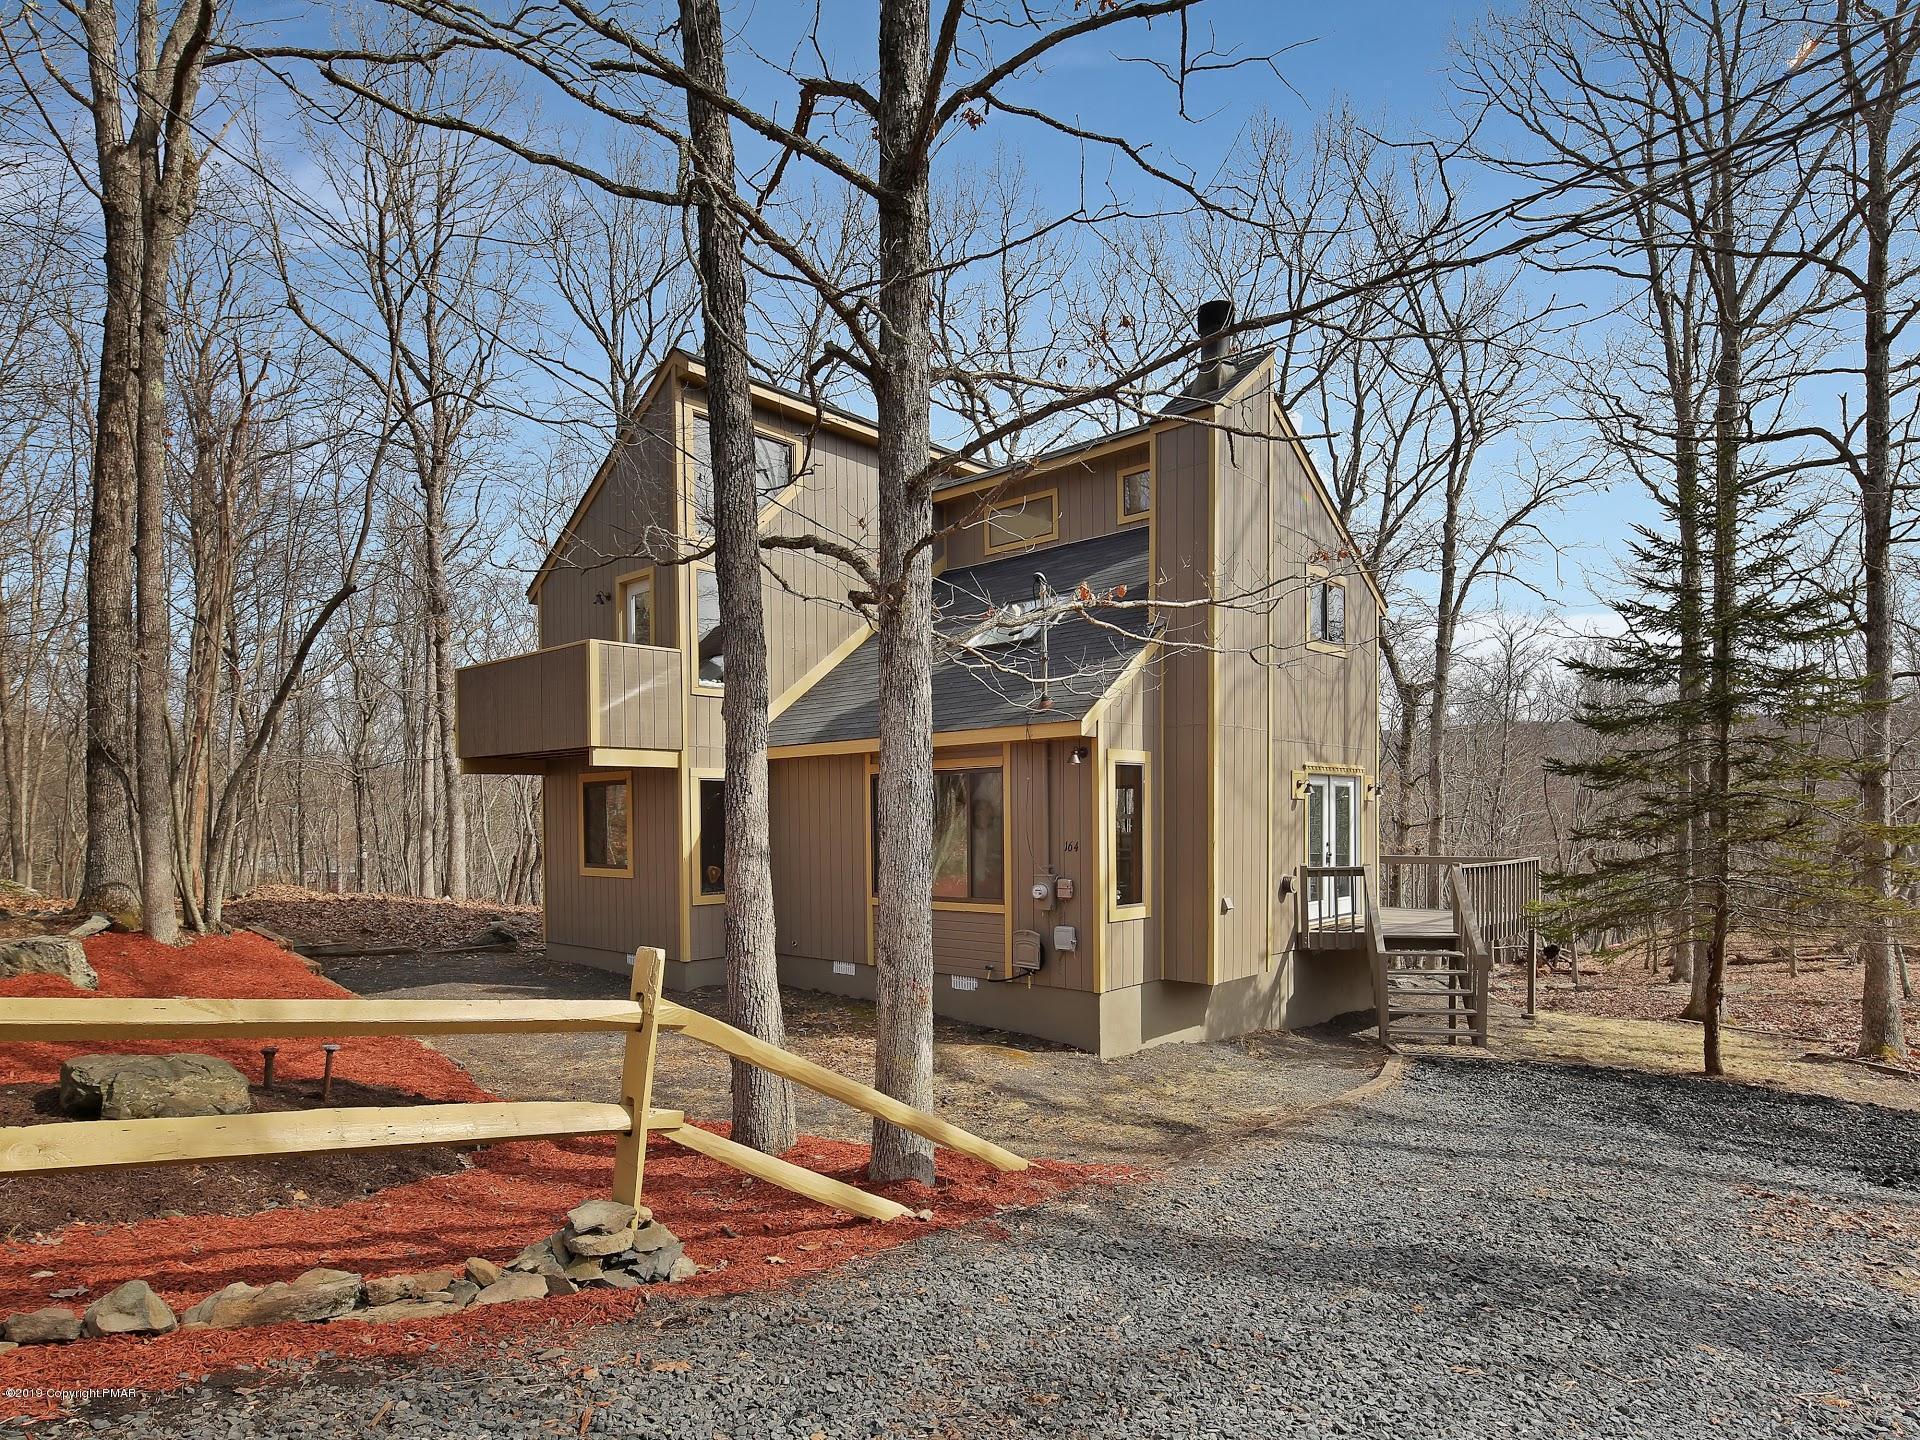 106 Harvard Ct., Bushkill, PA 18324